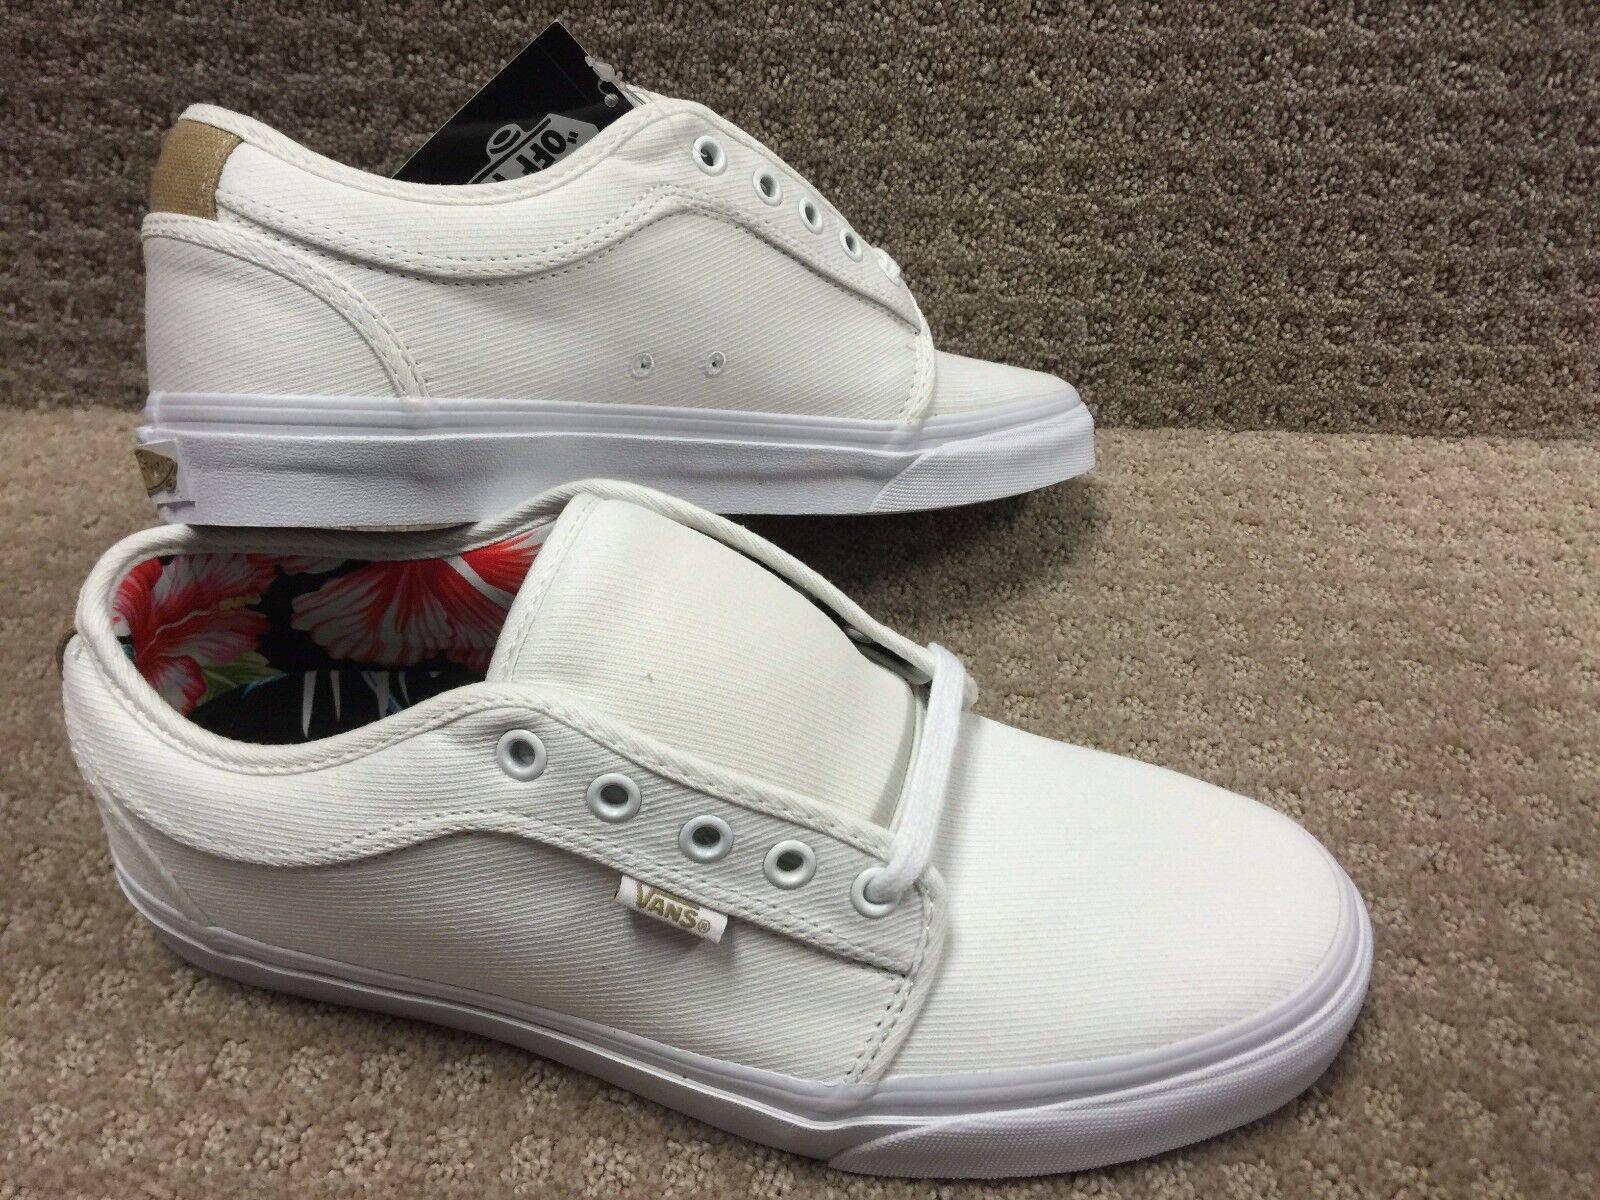 Vans hommes Chaussures